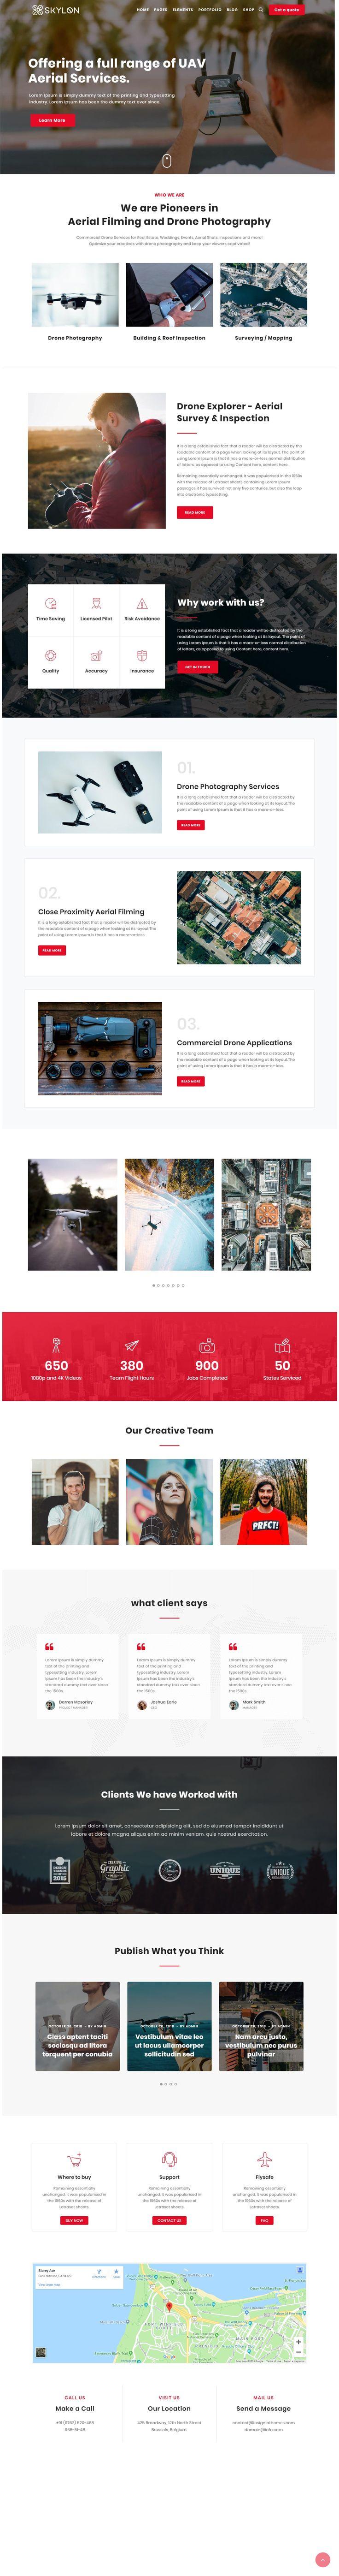 Skylon – Drone Aerial Photography & Videography WordPress Theme